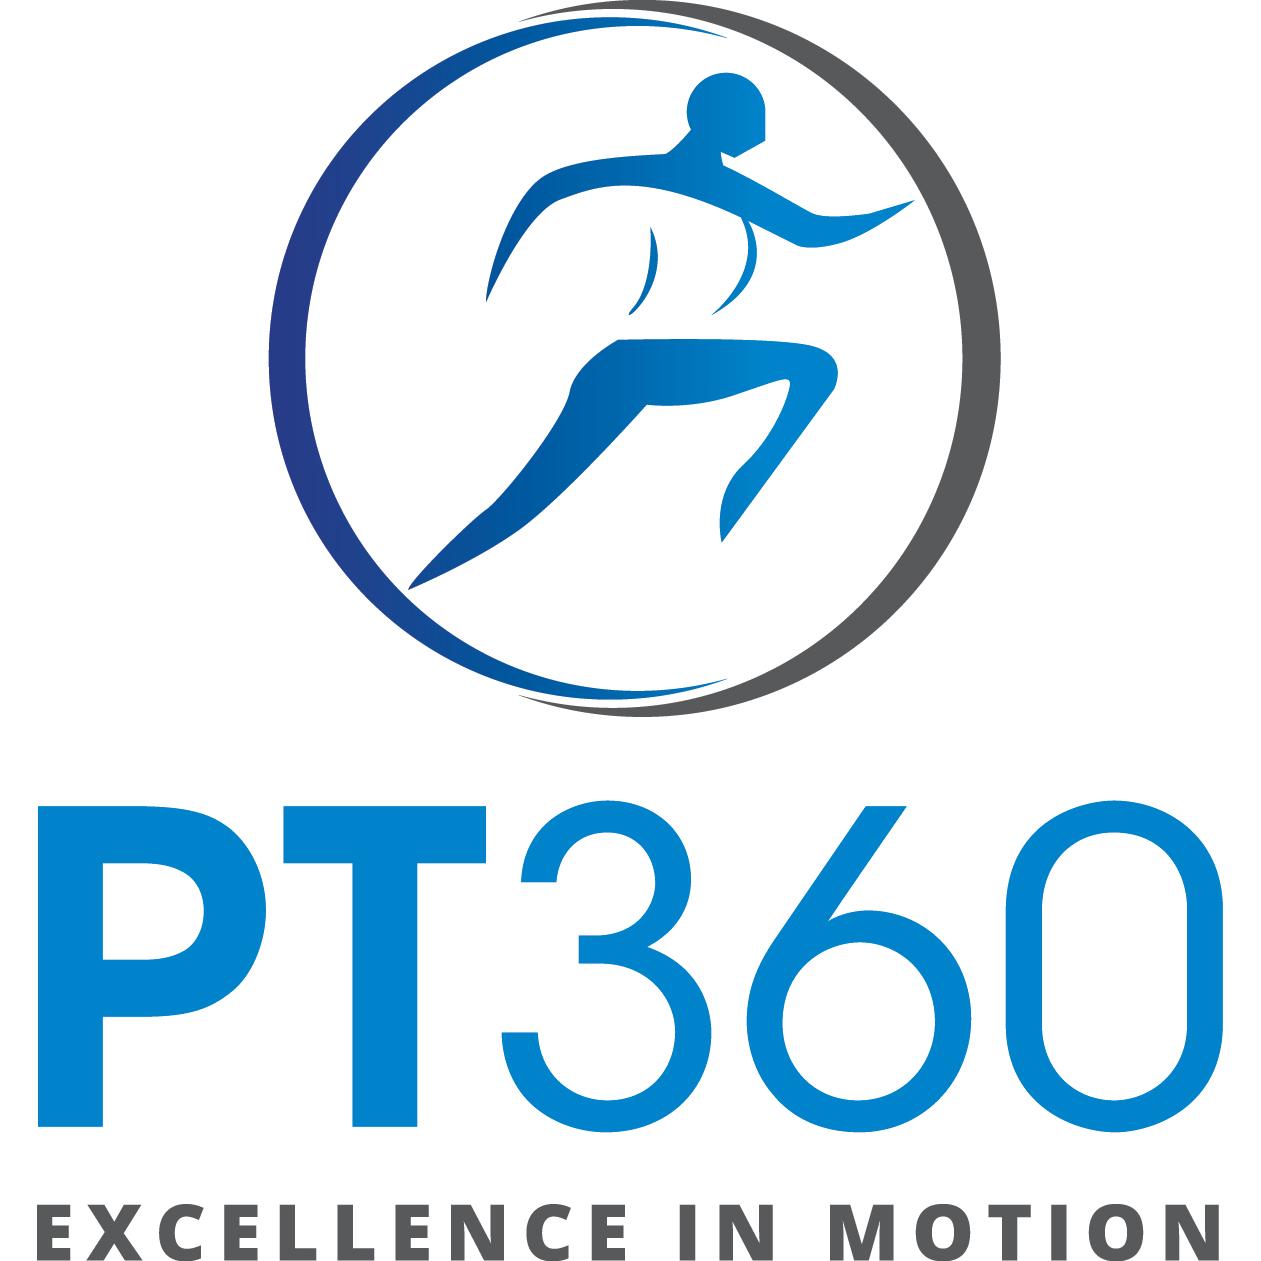 PT 360 image 4